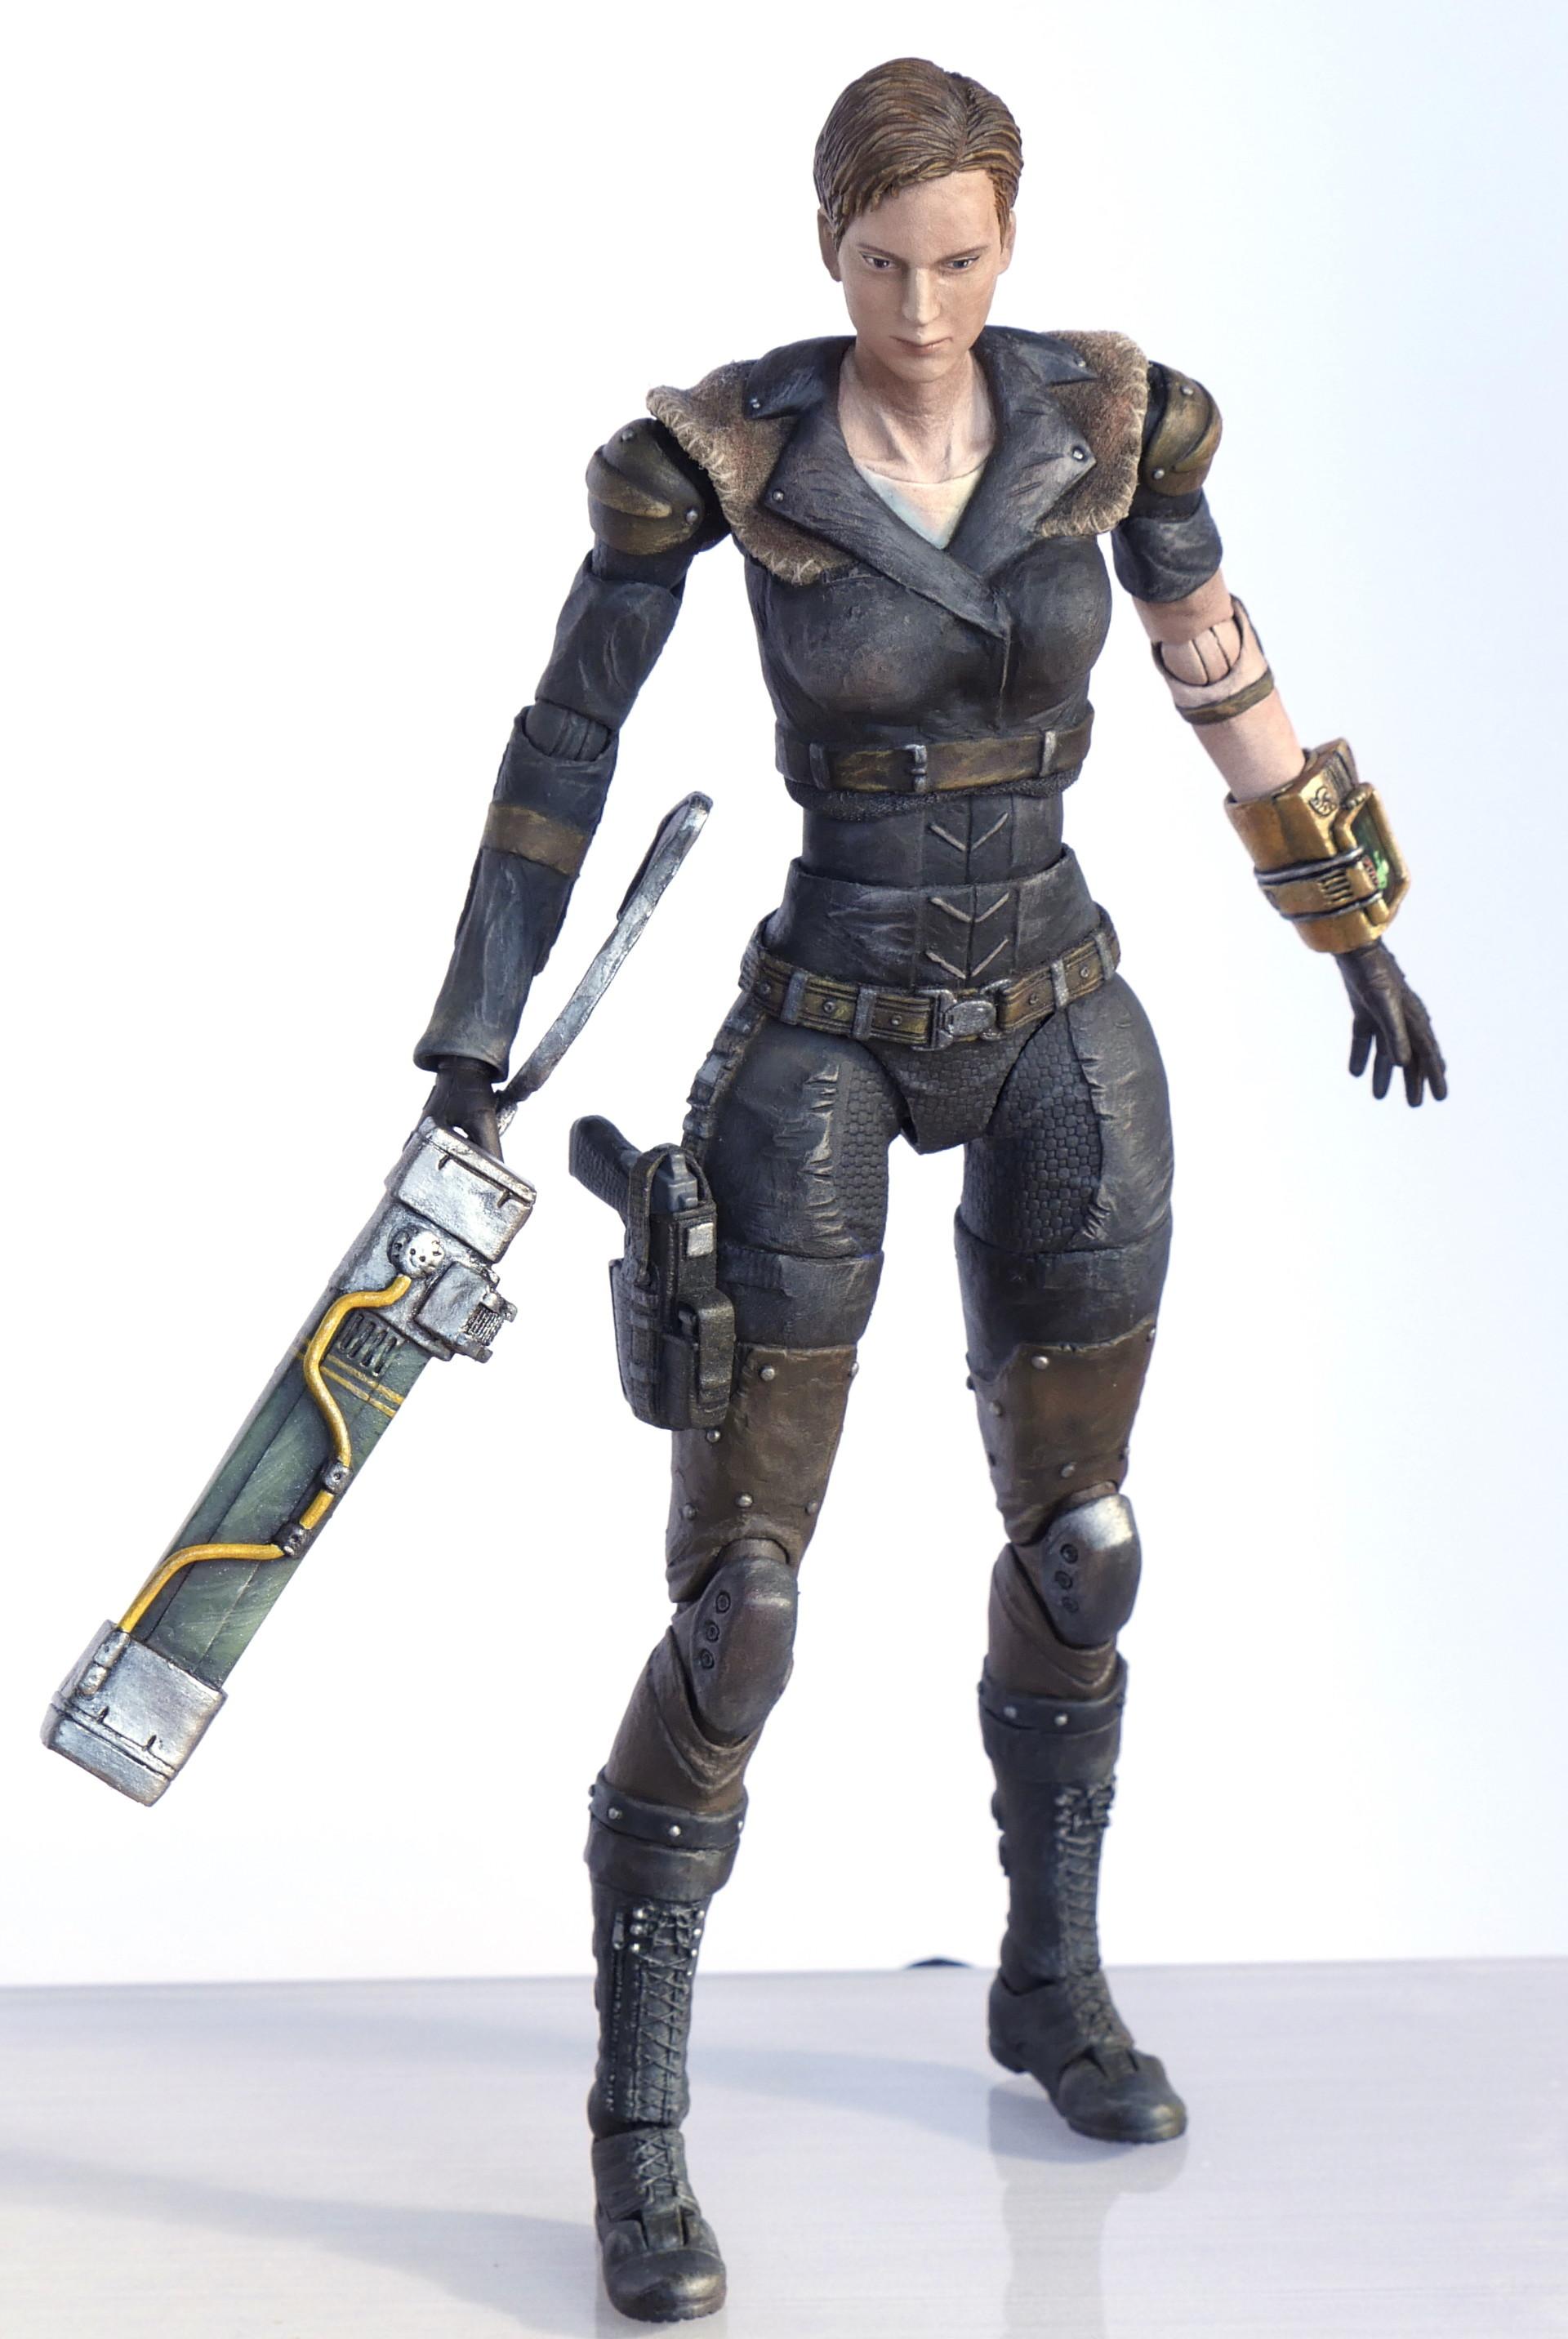 Michael Enea Fallout New Vegas The Female Courier